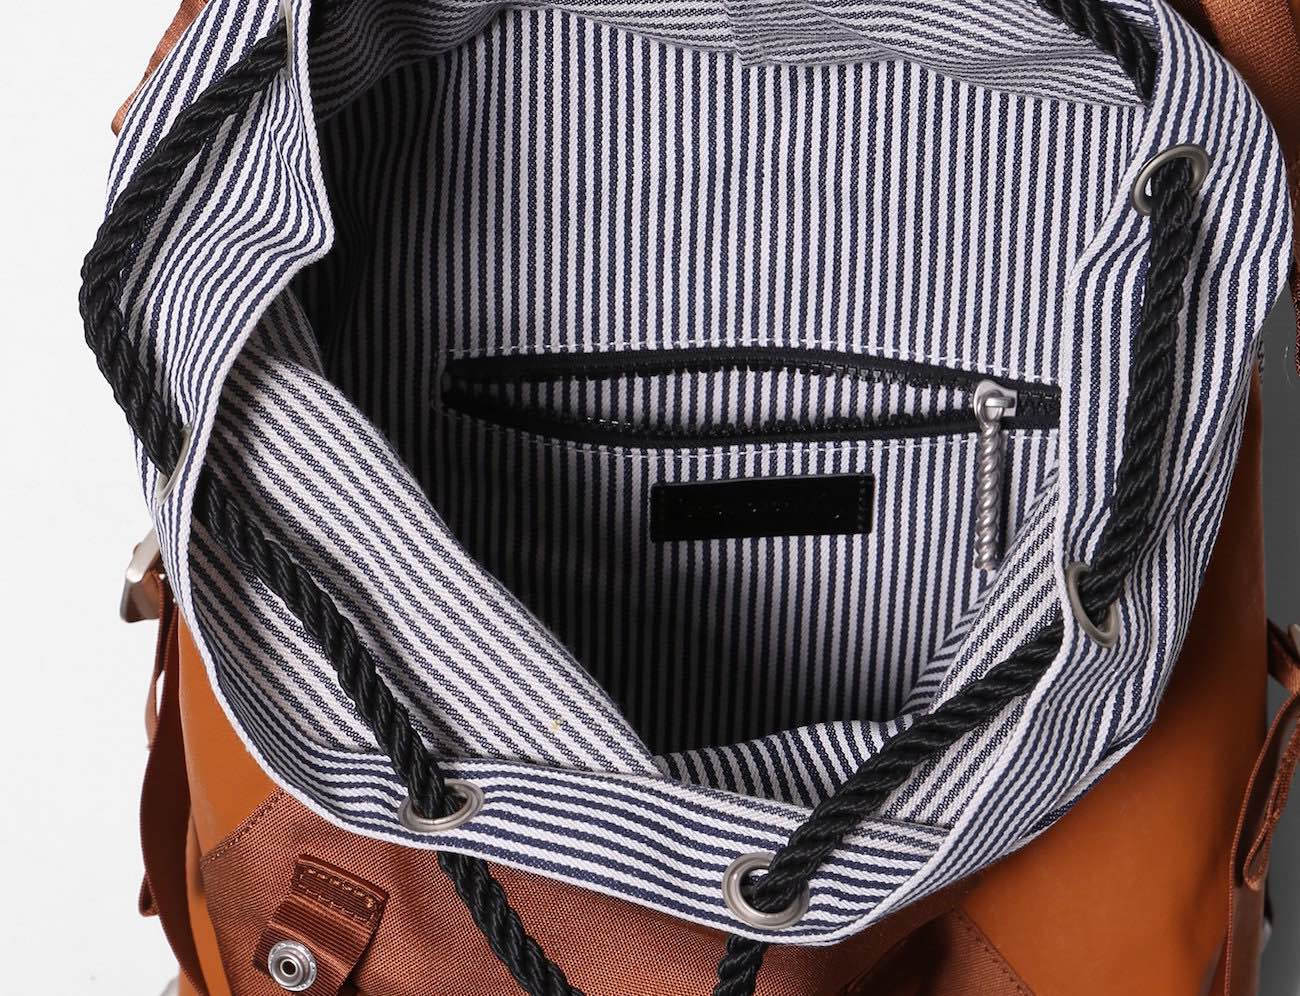 Conn Laptop Backpack by Stighlorgan